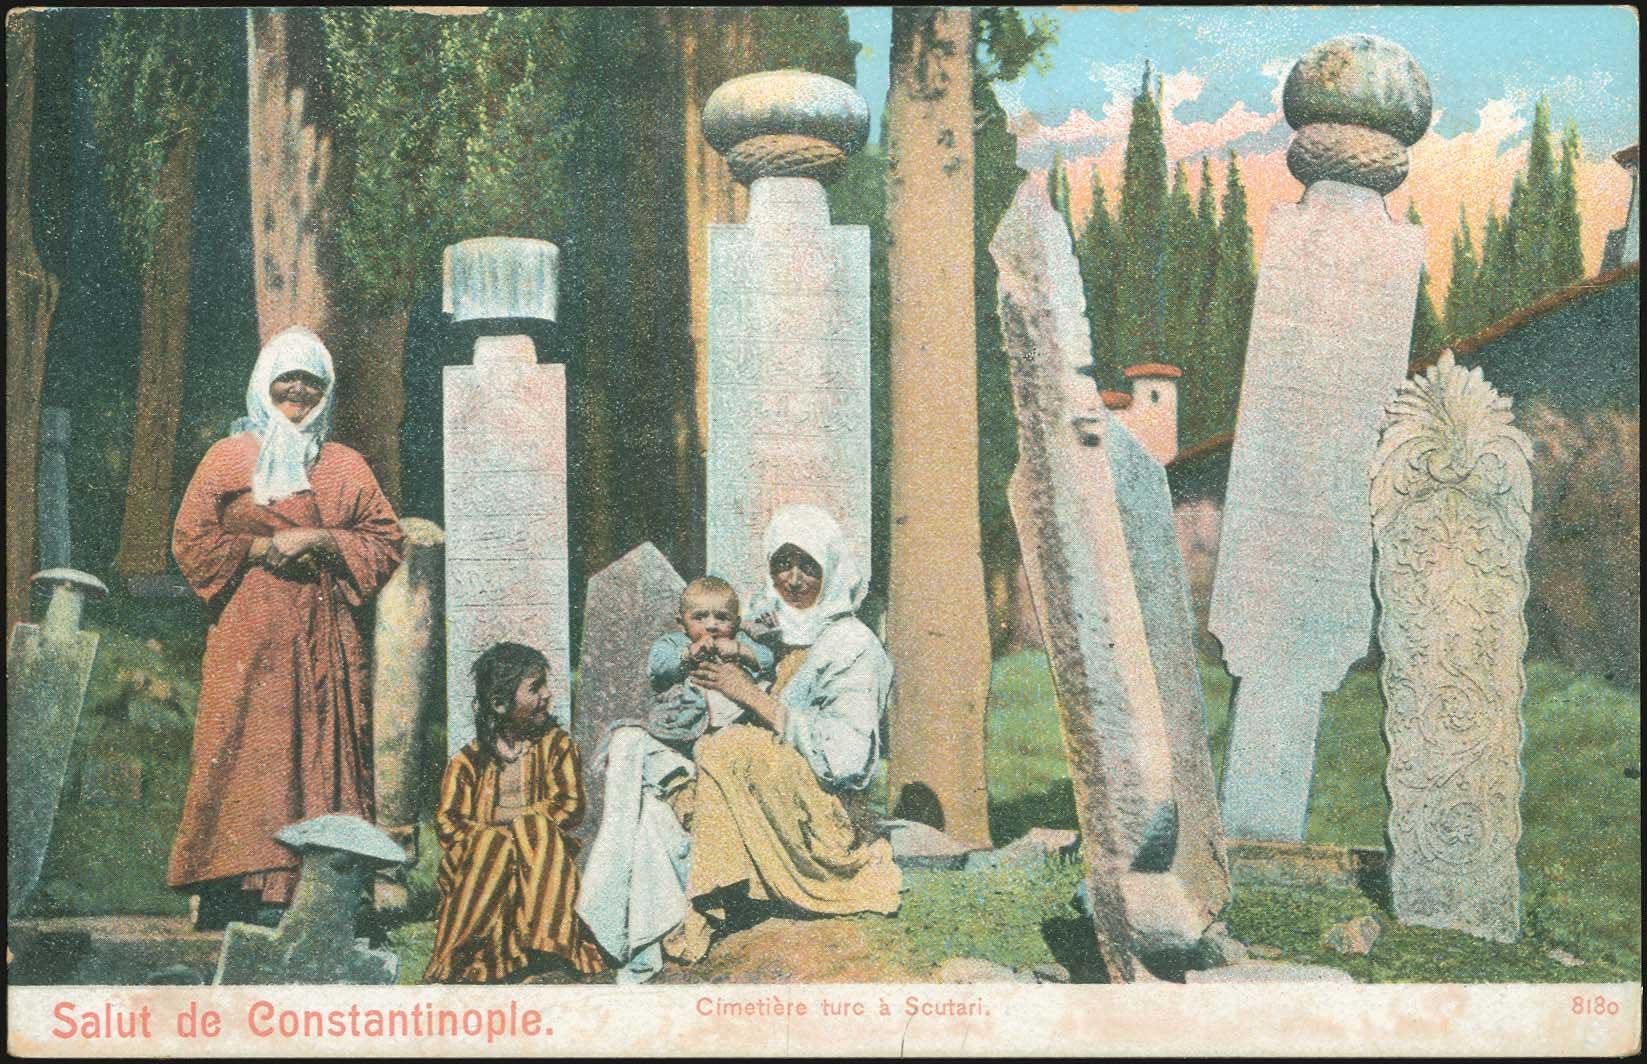 Lot 1762 - -  PICTURE POSTCARDS SMYRNE, CONSTANTINOPLE, ASIA MINOR -  A. Karamitsos Public & Live Internet Auction 675